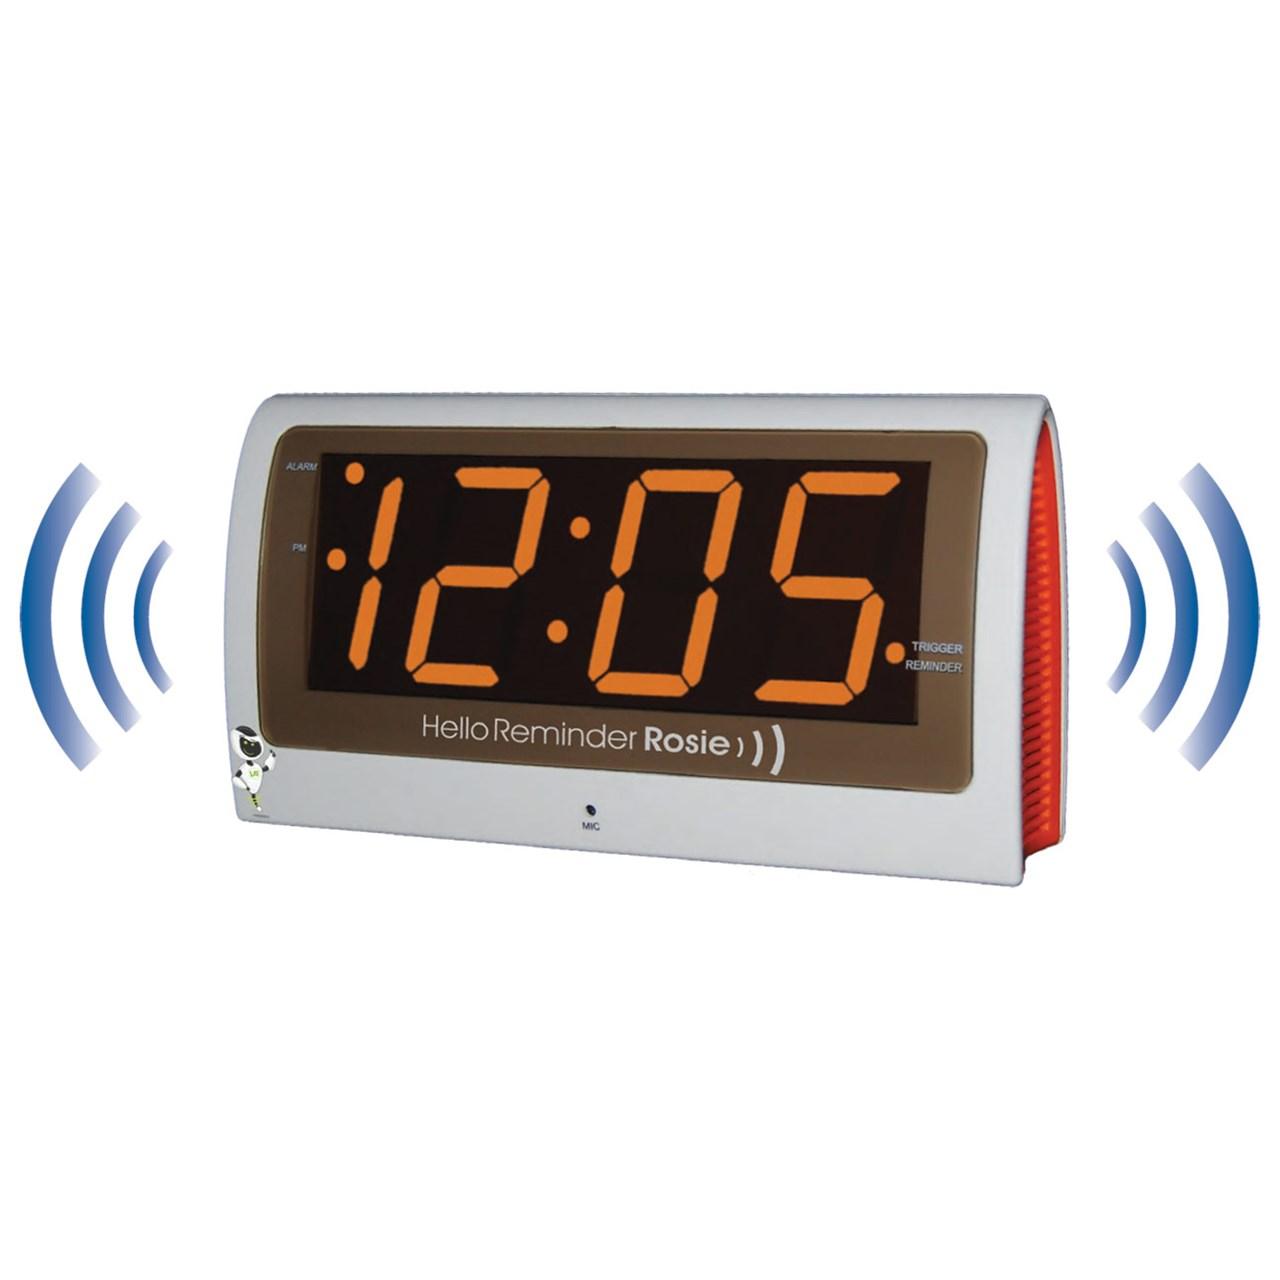 MaxiAids | Reminder Rosie Talking Alarm Clock with ...